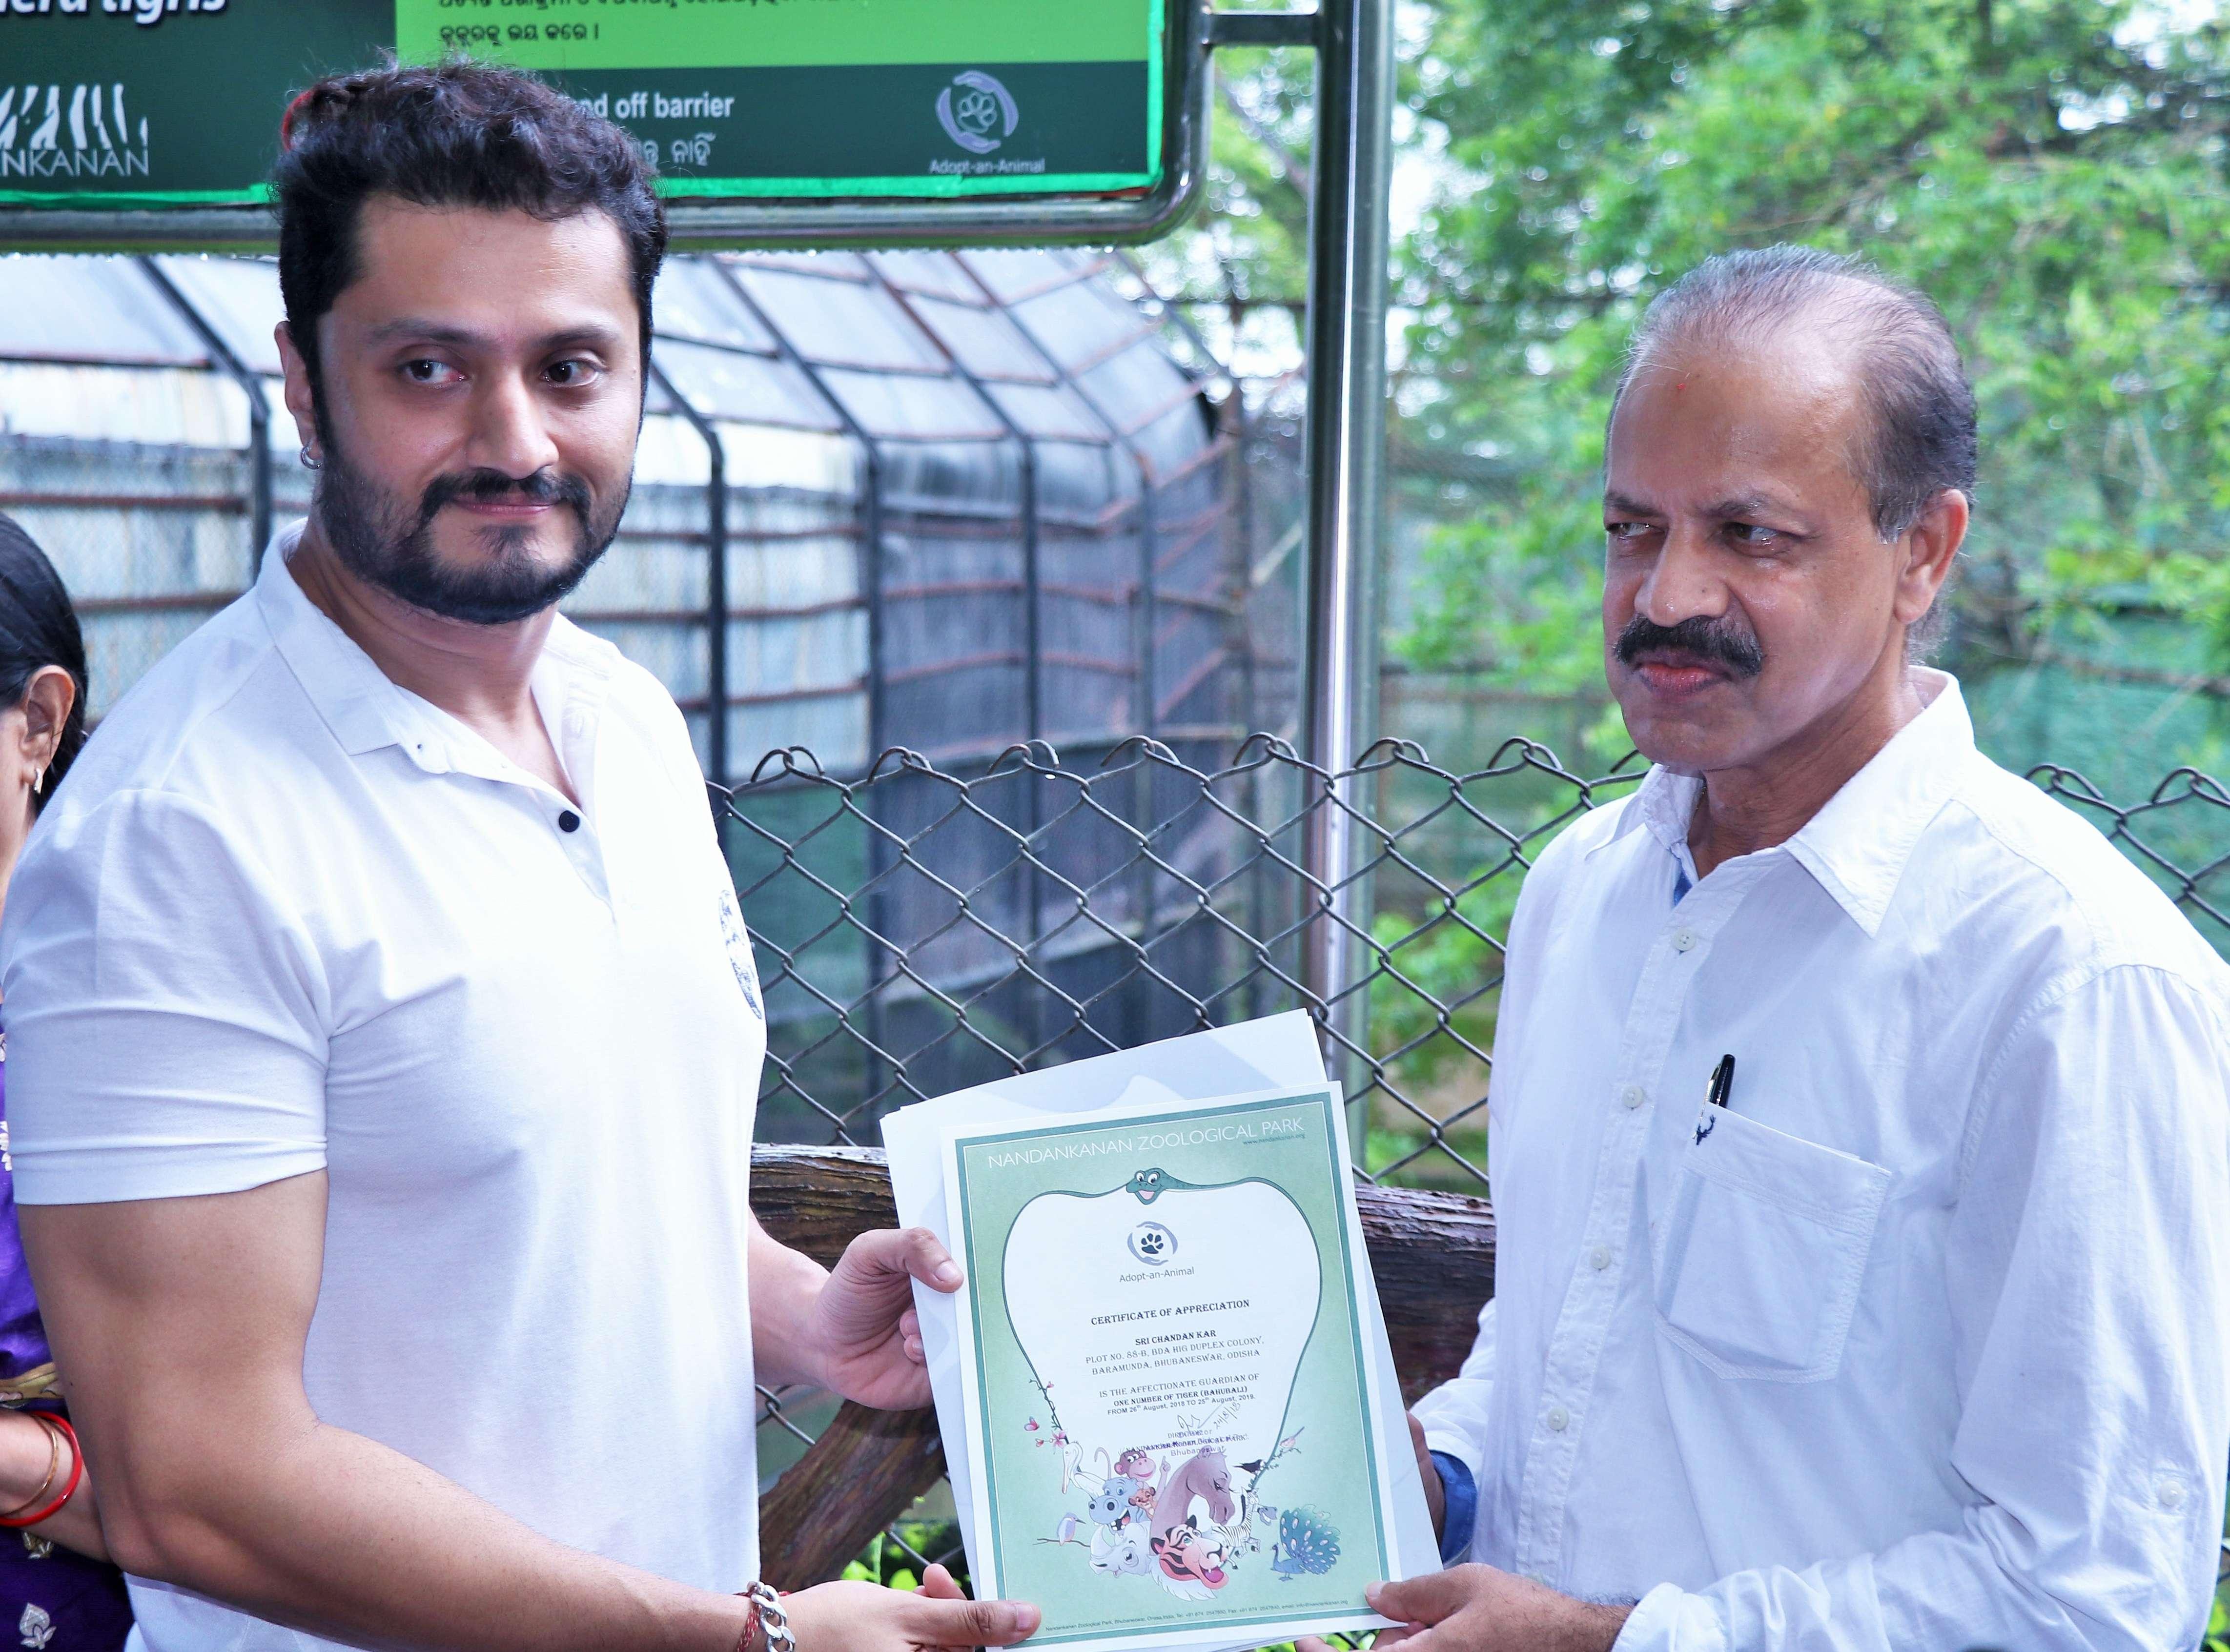 Deputy Director Jayant Das hands over the certificate of appreciation to Chandan Kar near Bahubali's enclosure - Copy